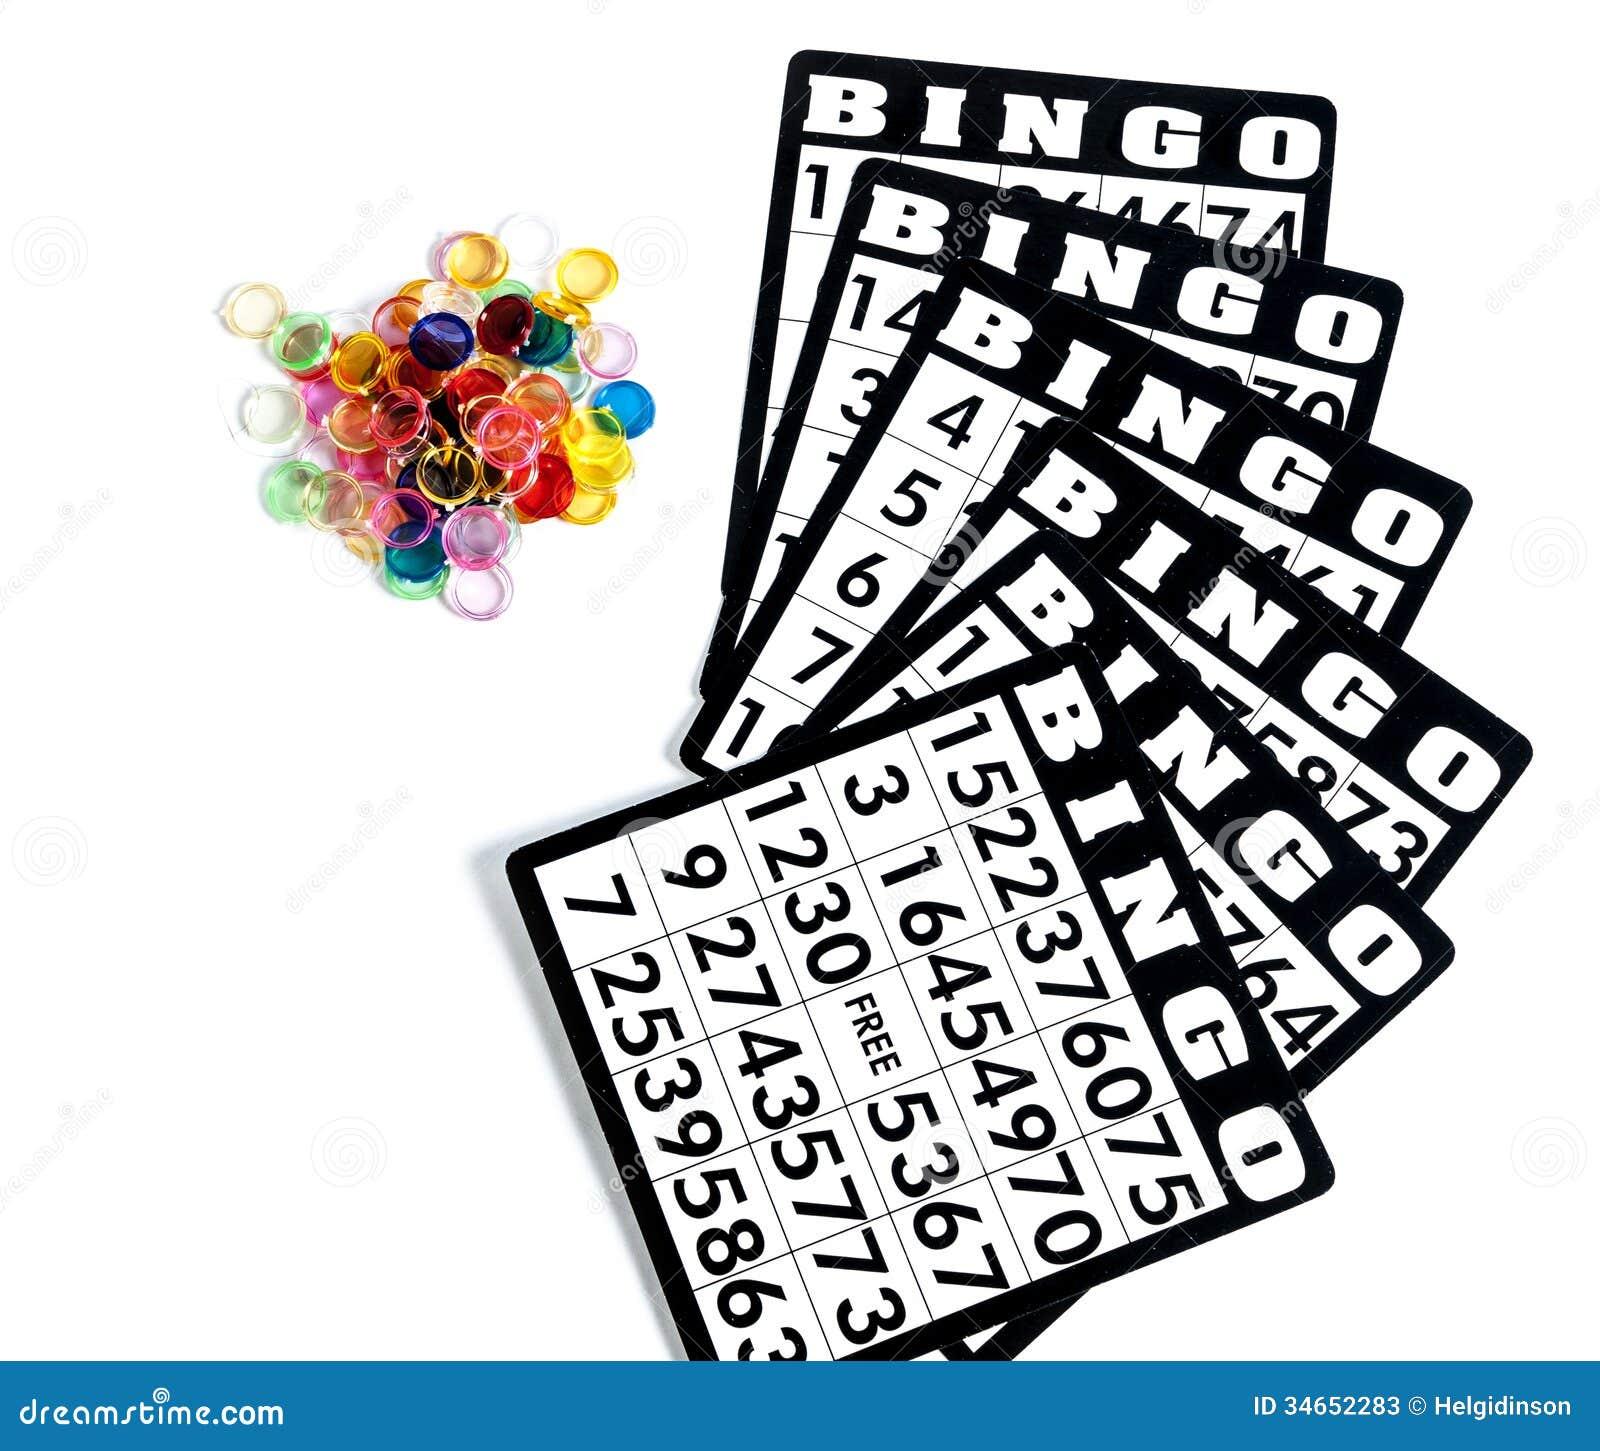 Bingo Cards Stock Photos - Image: 34652283